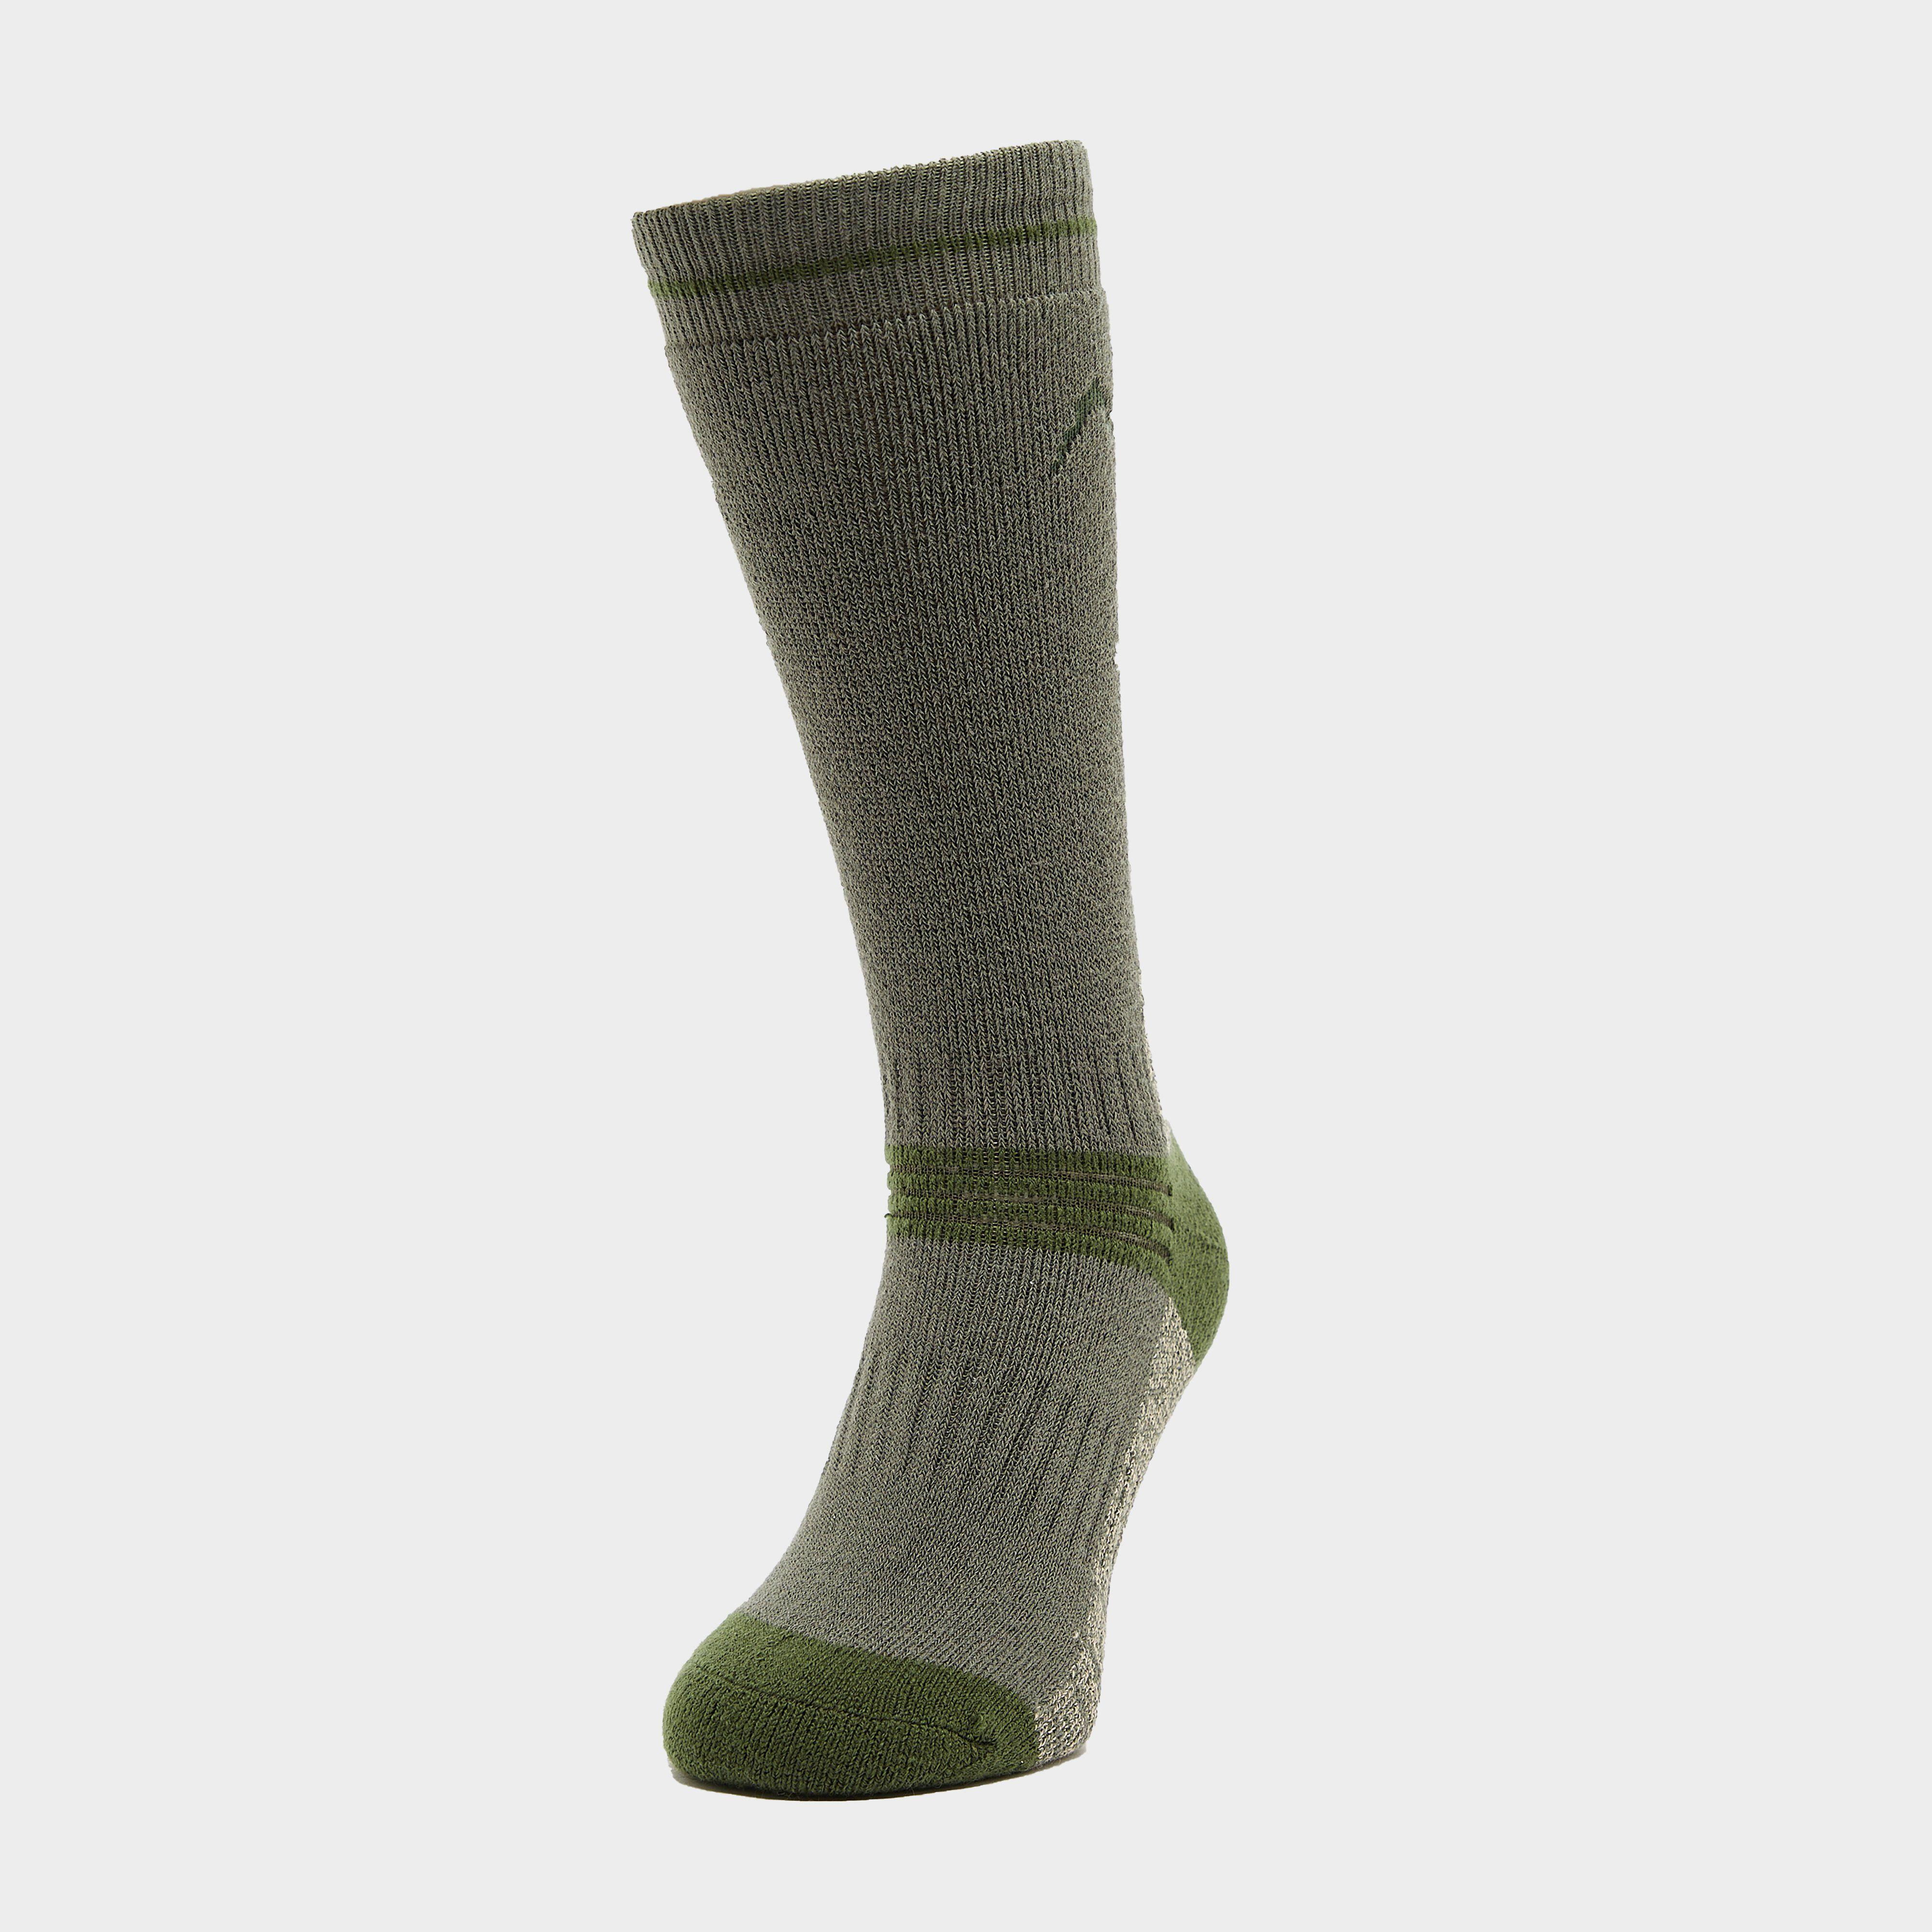 PETER STORM Heavyweight Outdoor Socks - 2 Pack